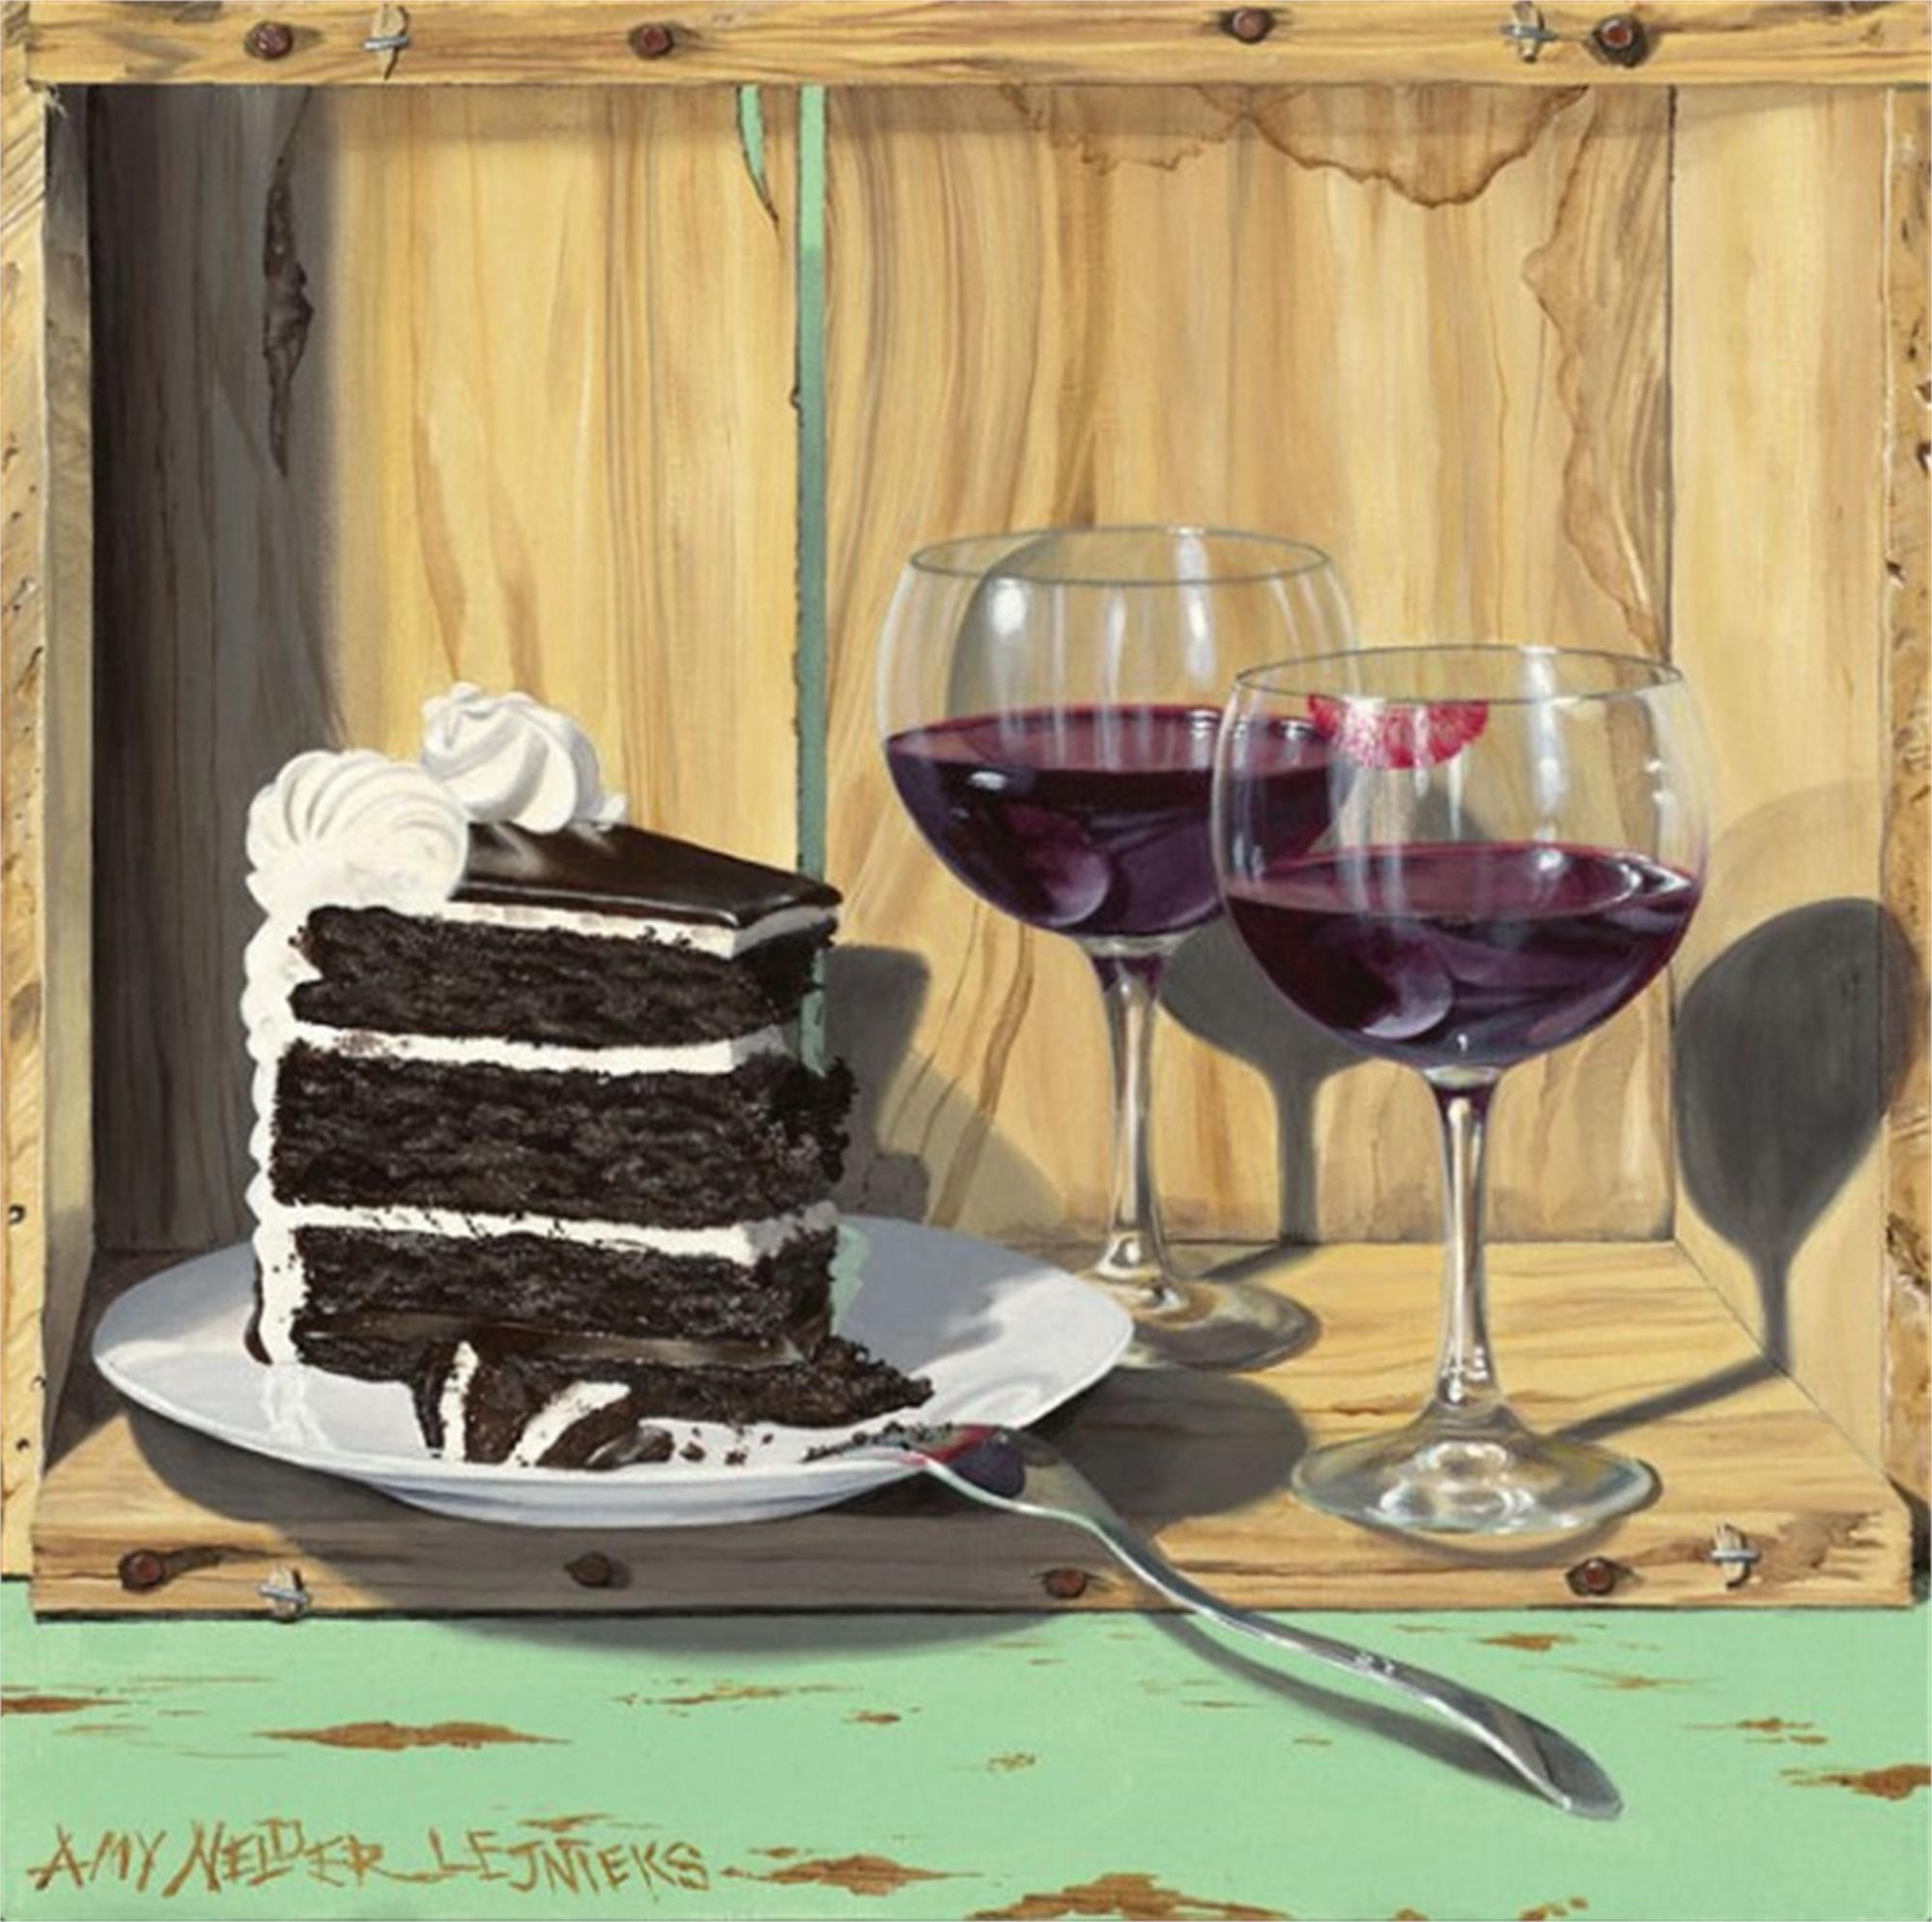 Cake Interrupted by Amy Nelder